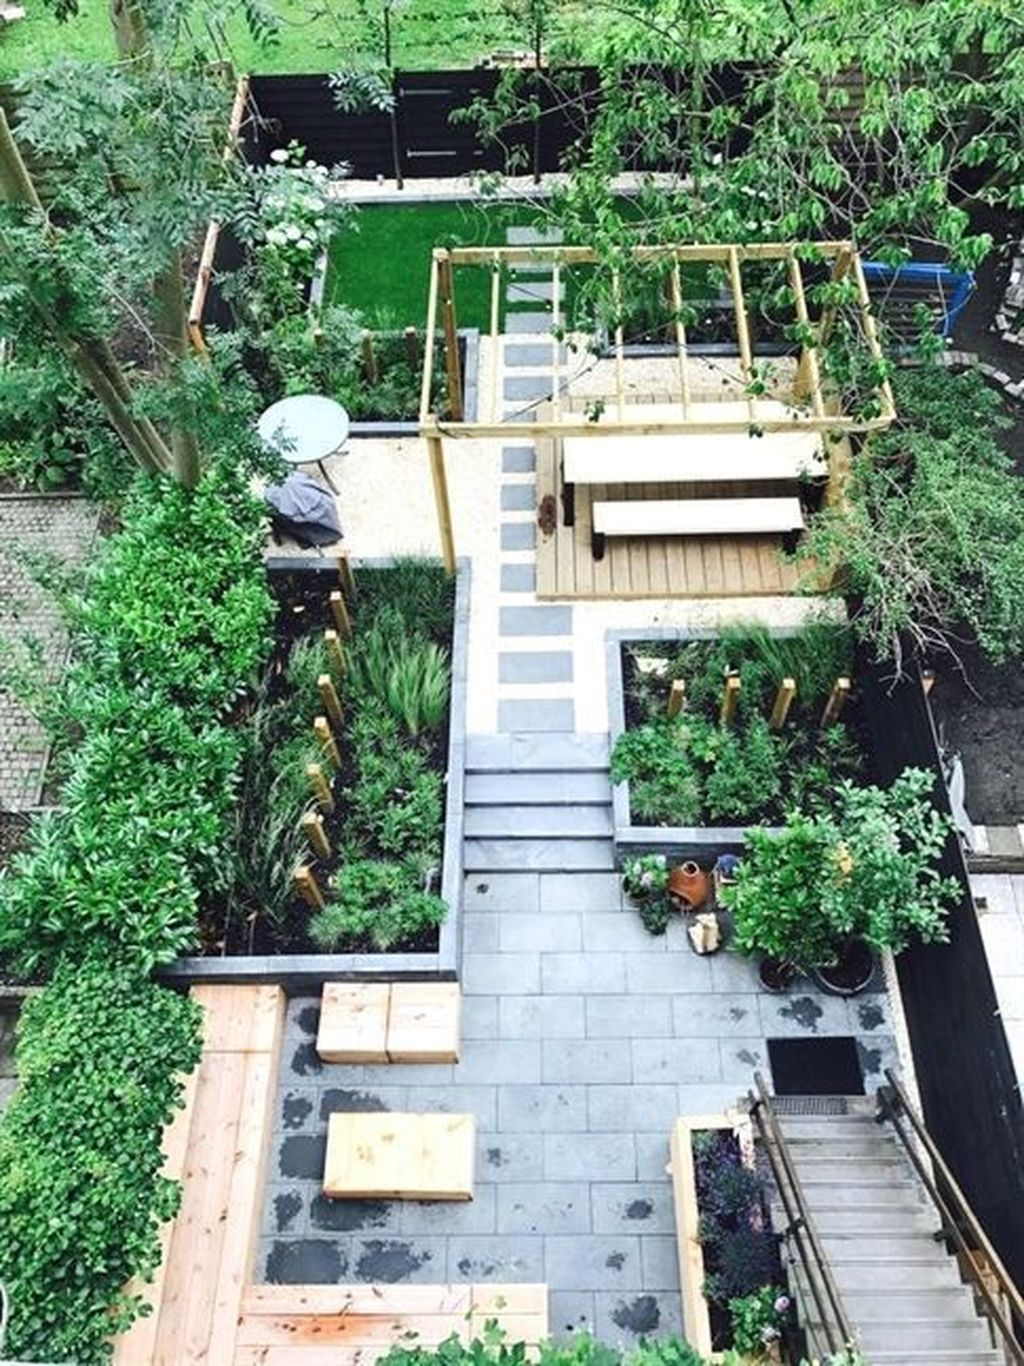 The Best Urban Garden Design Ideas For Your Backyard 31